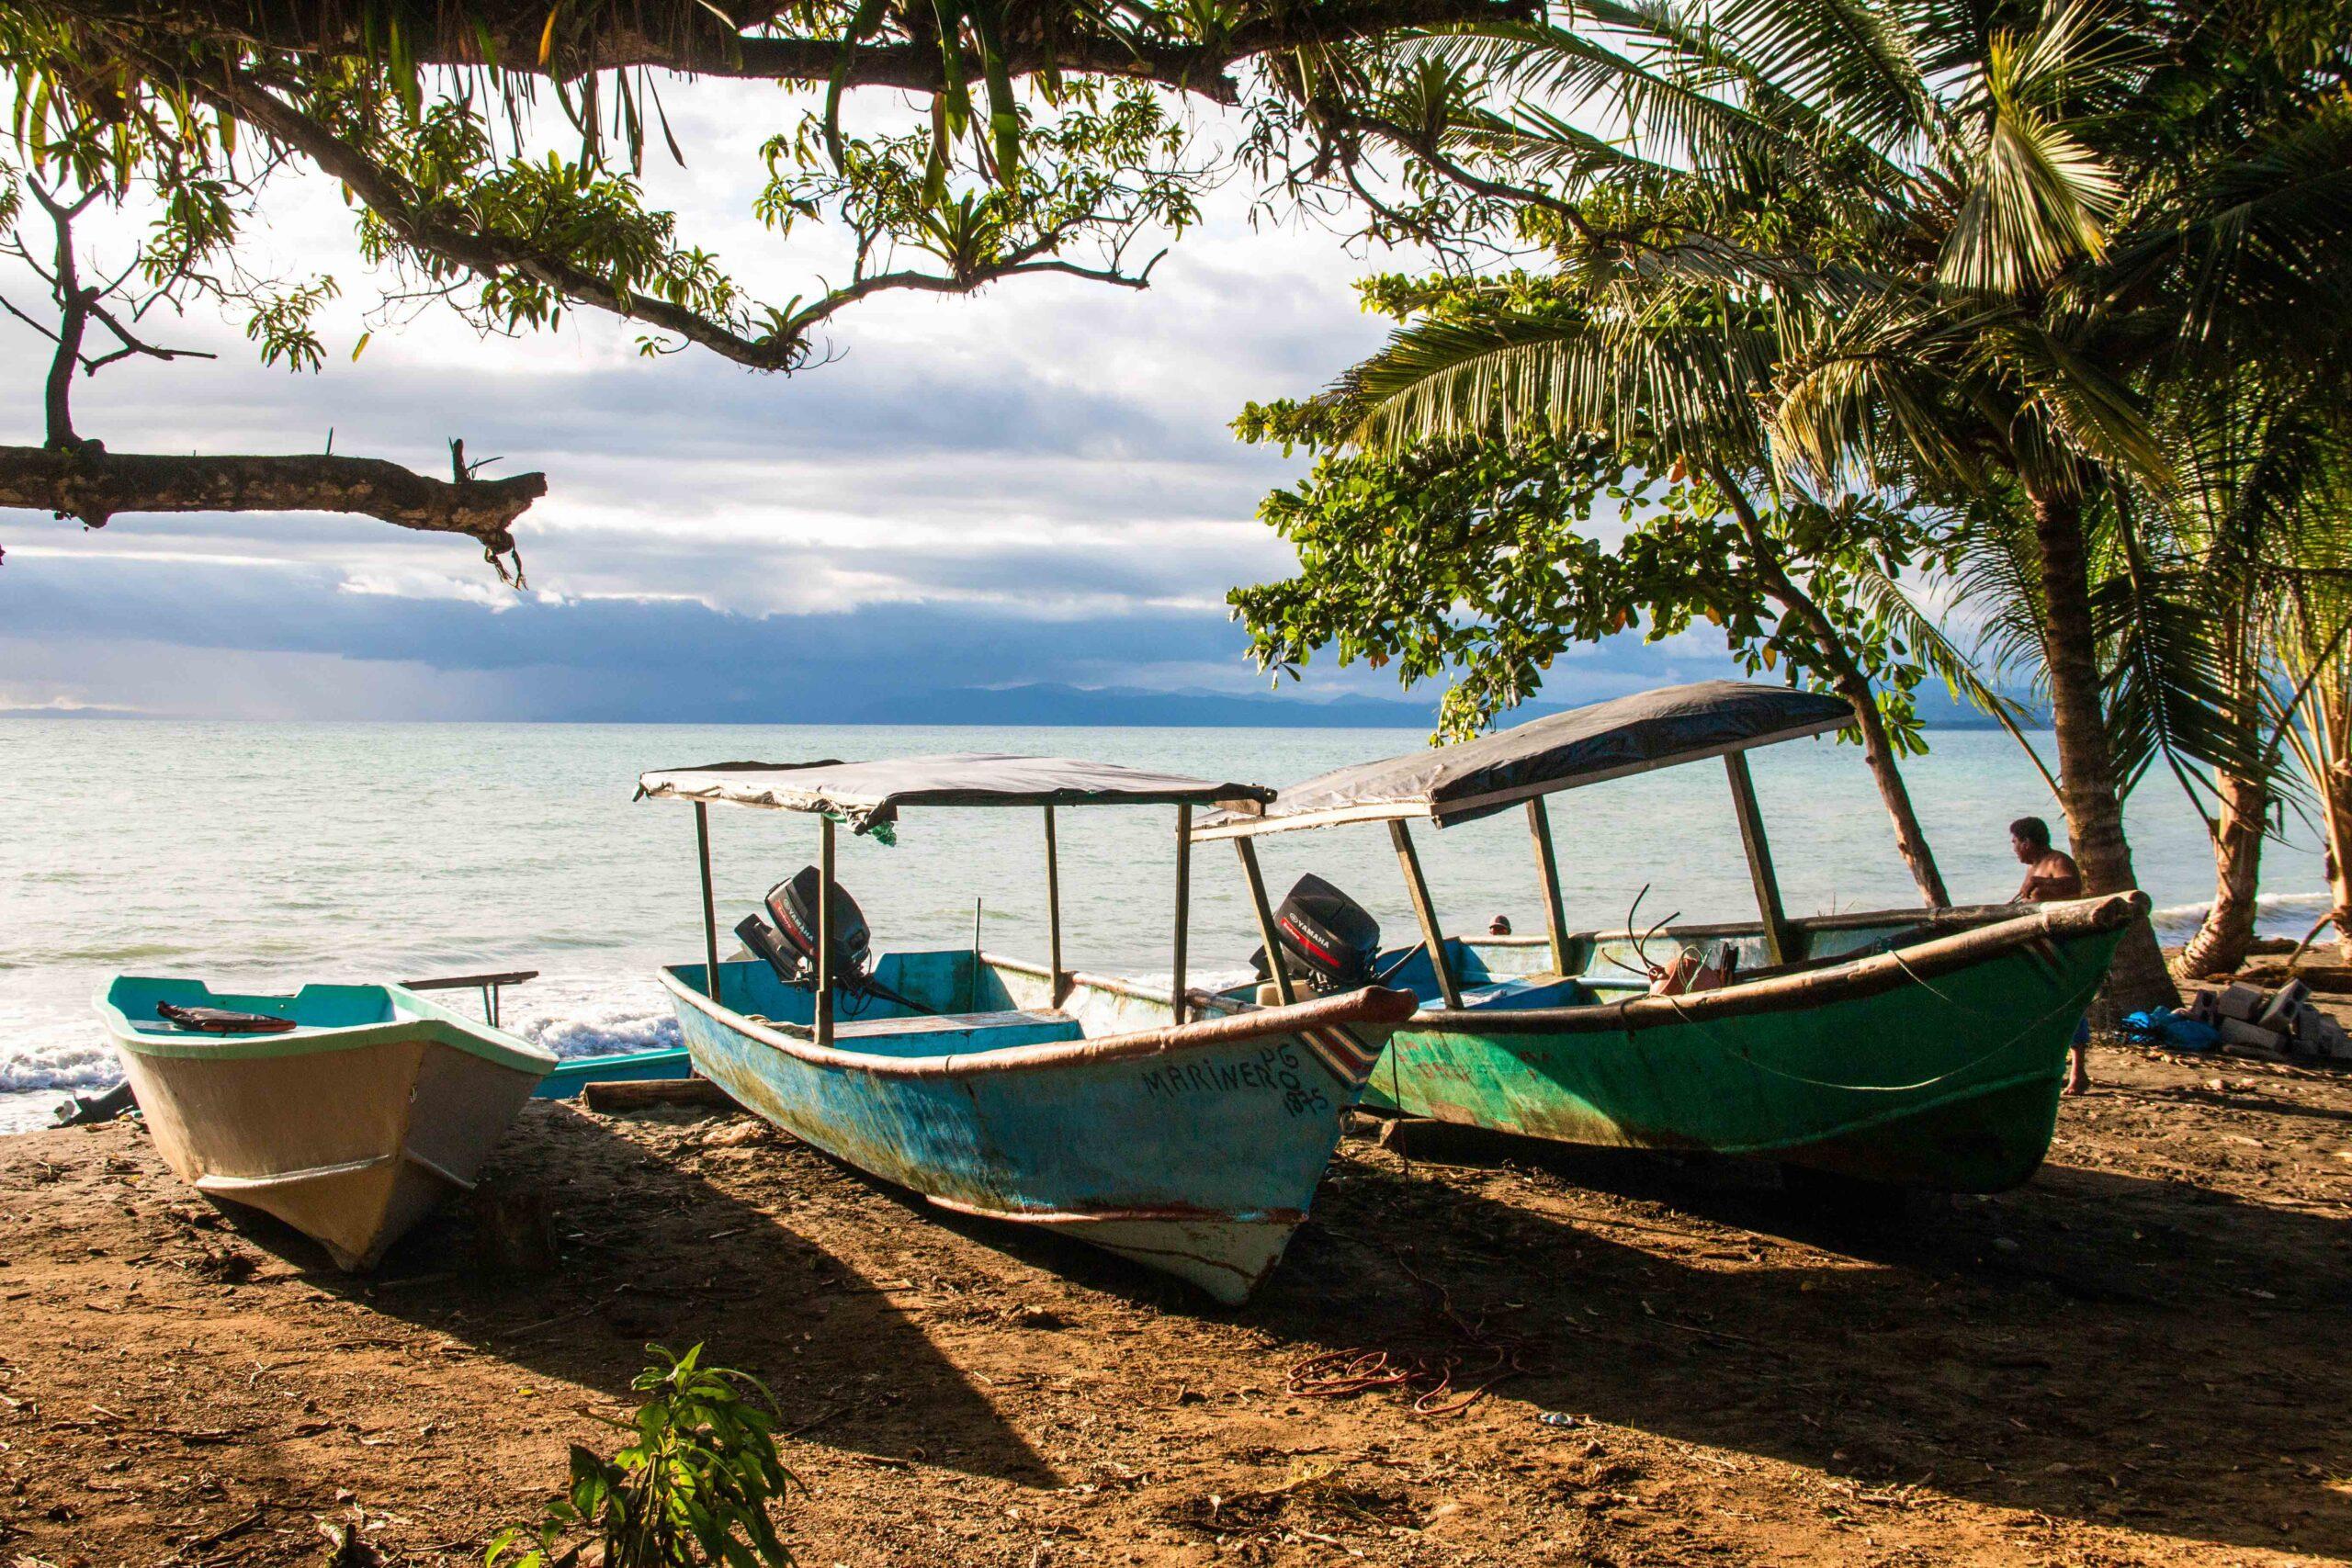 Boat trip to Matapalo Costa Rica